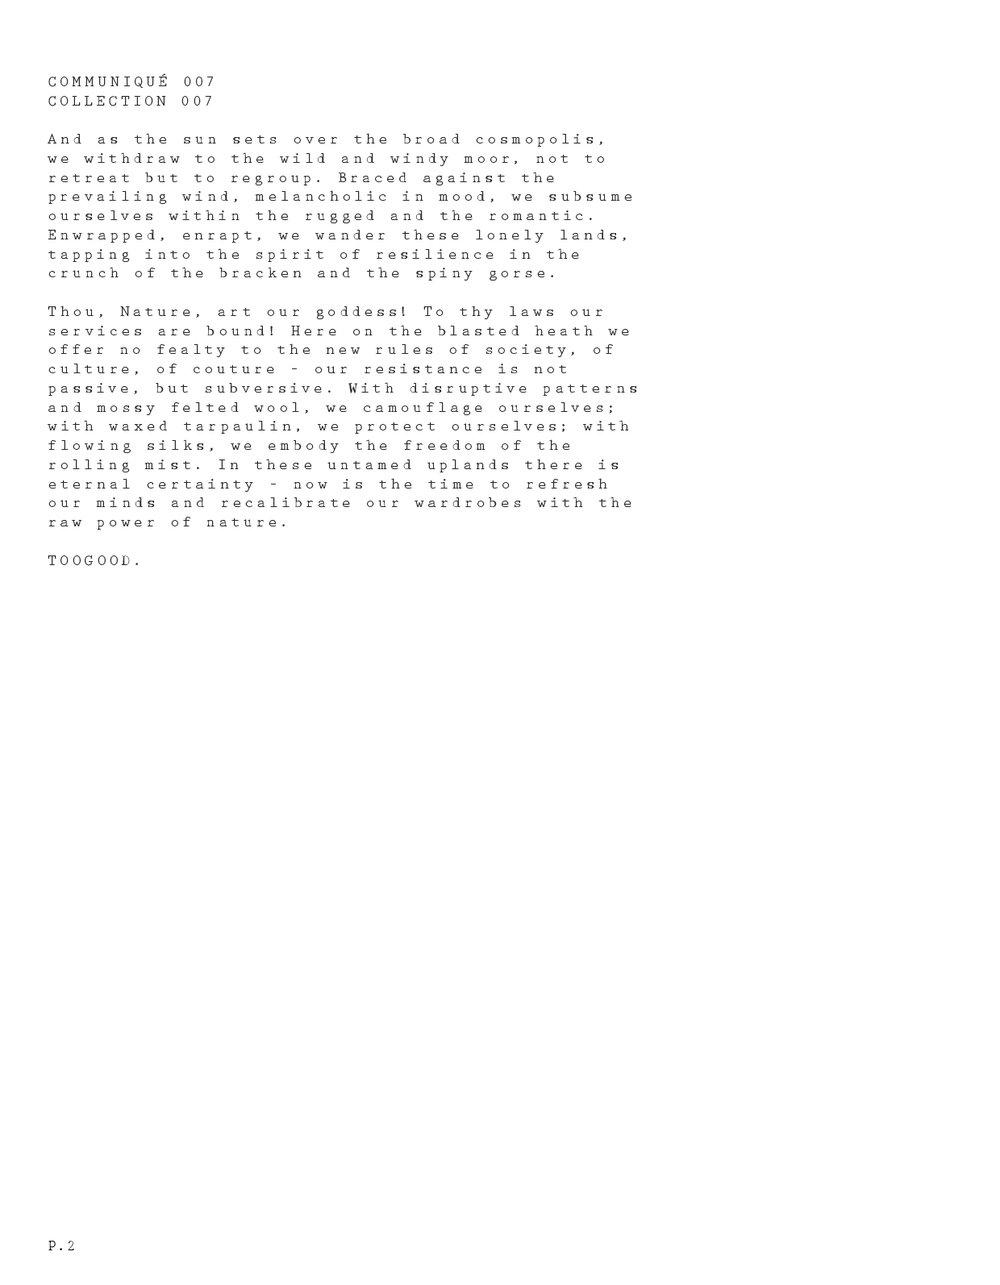 007_Toogood_Collection_Book_DIGITAL_LoRES2.jpg